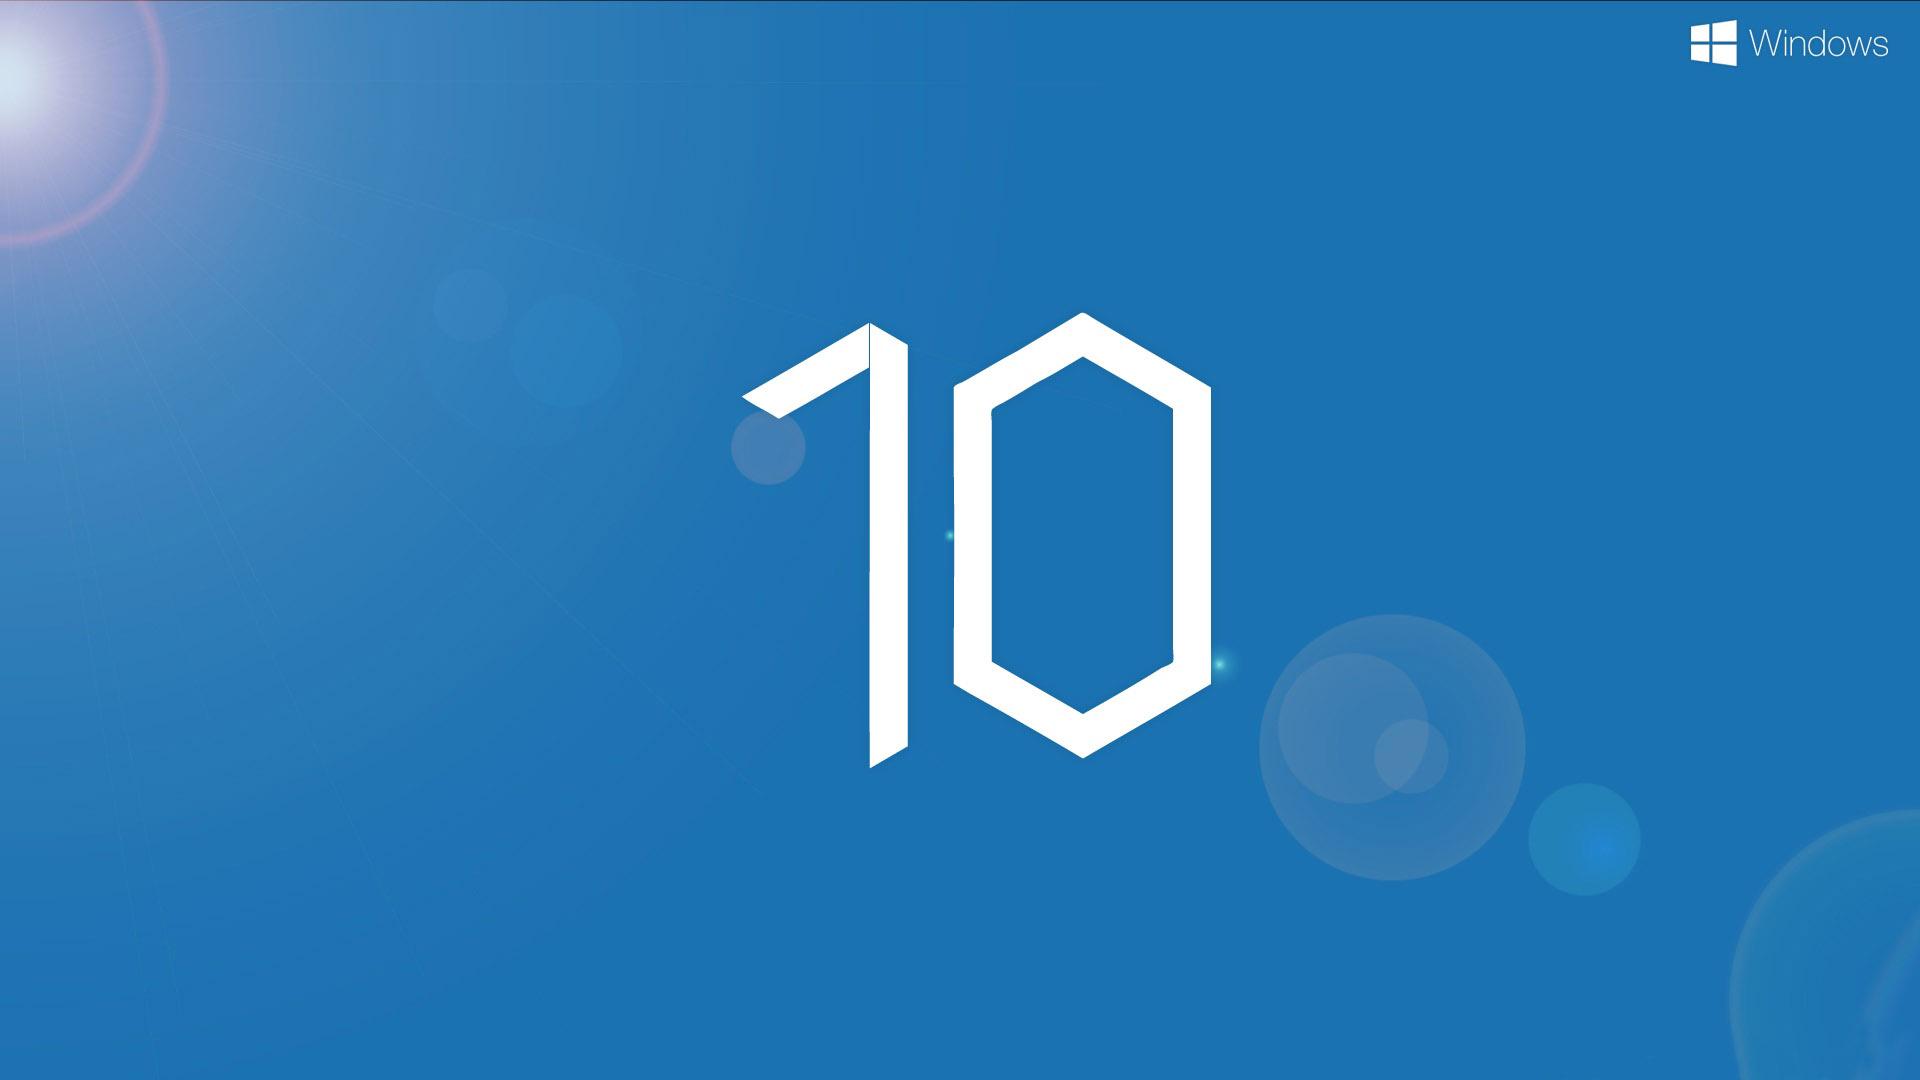 Windows 10 HD Wallpapers 2015 Tech96 1920x1080